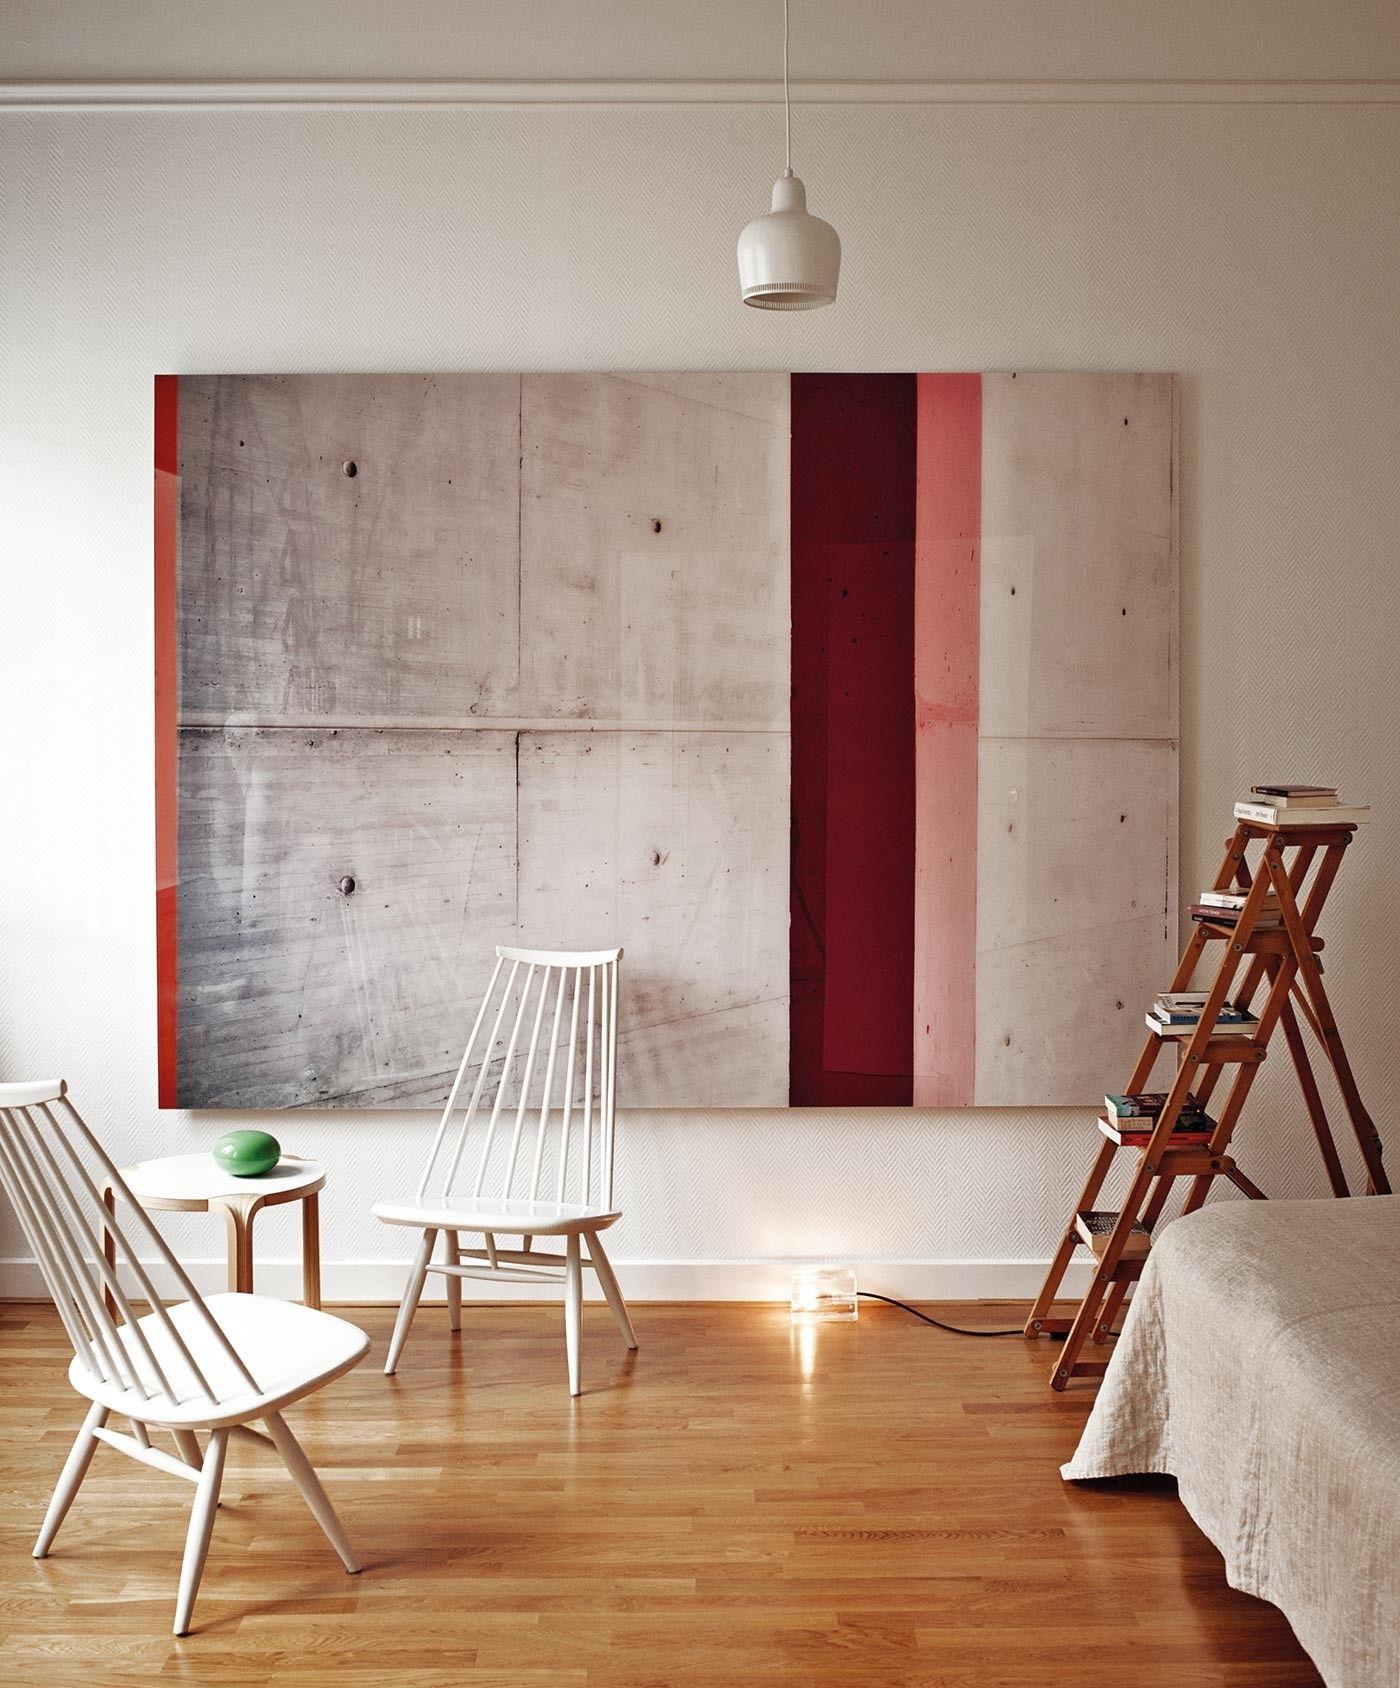 Design Stoel Lounge.Artek Mademoiselle Lounge Stoel Interior Design Interior Mid